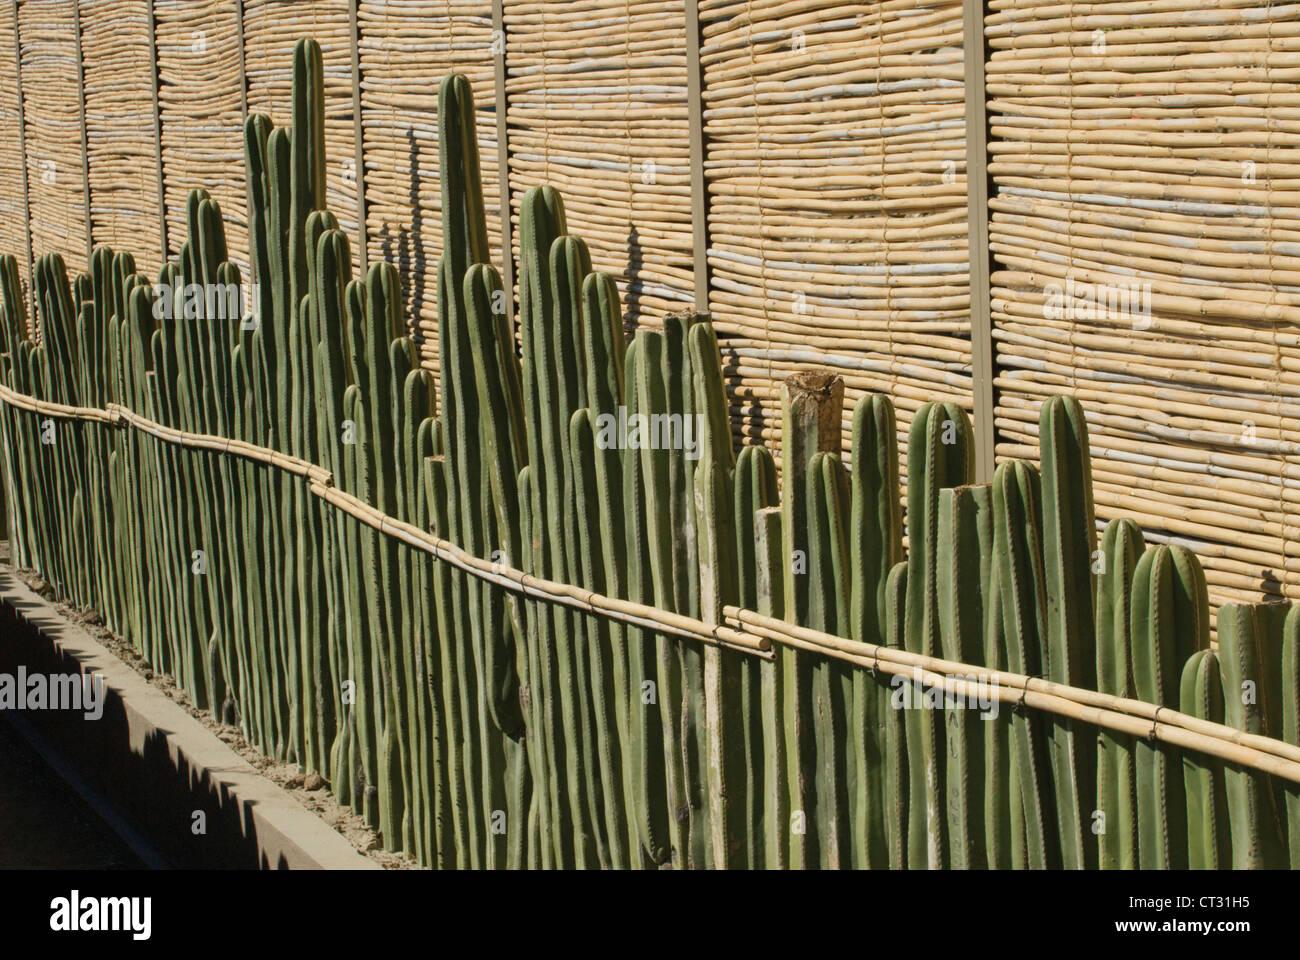 Pachycereus Marginatus, Cactus, mexican fence post cactus - Stock Image